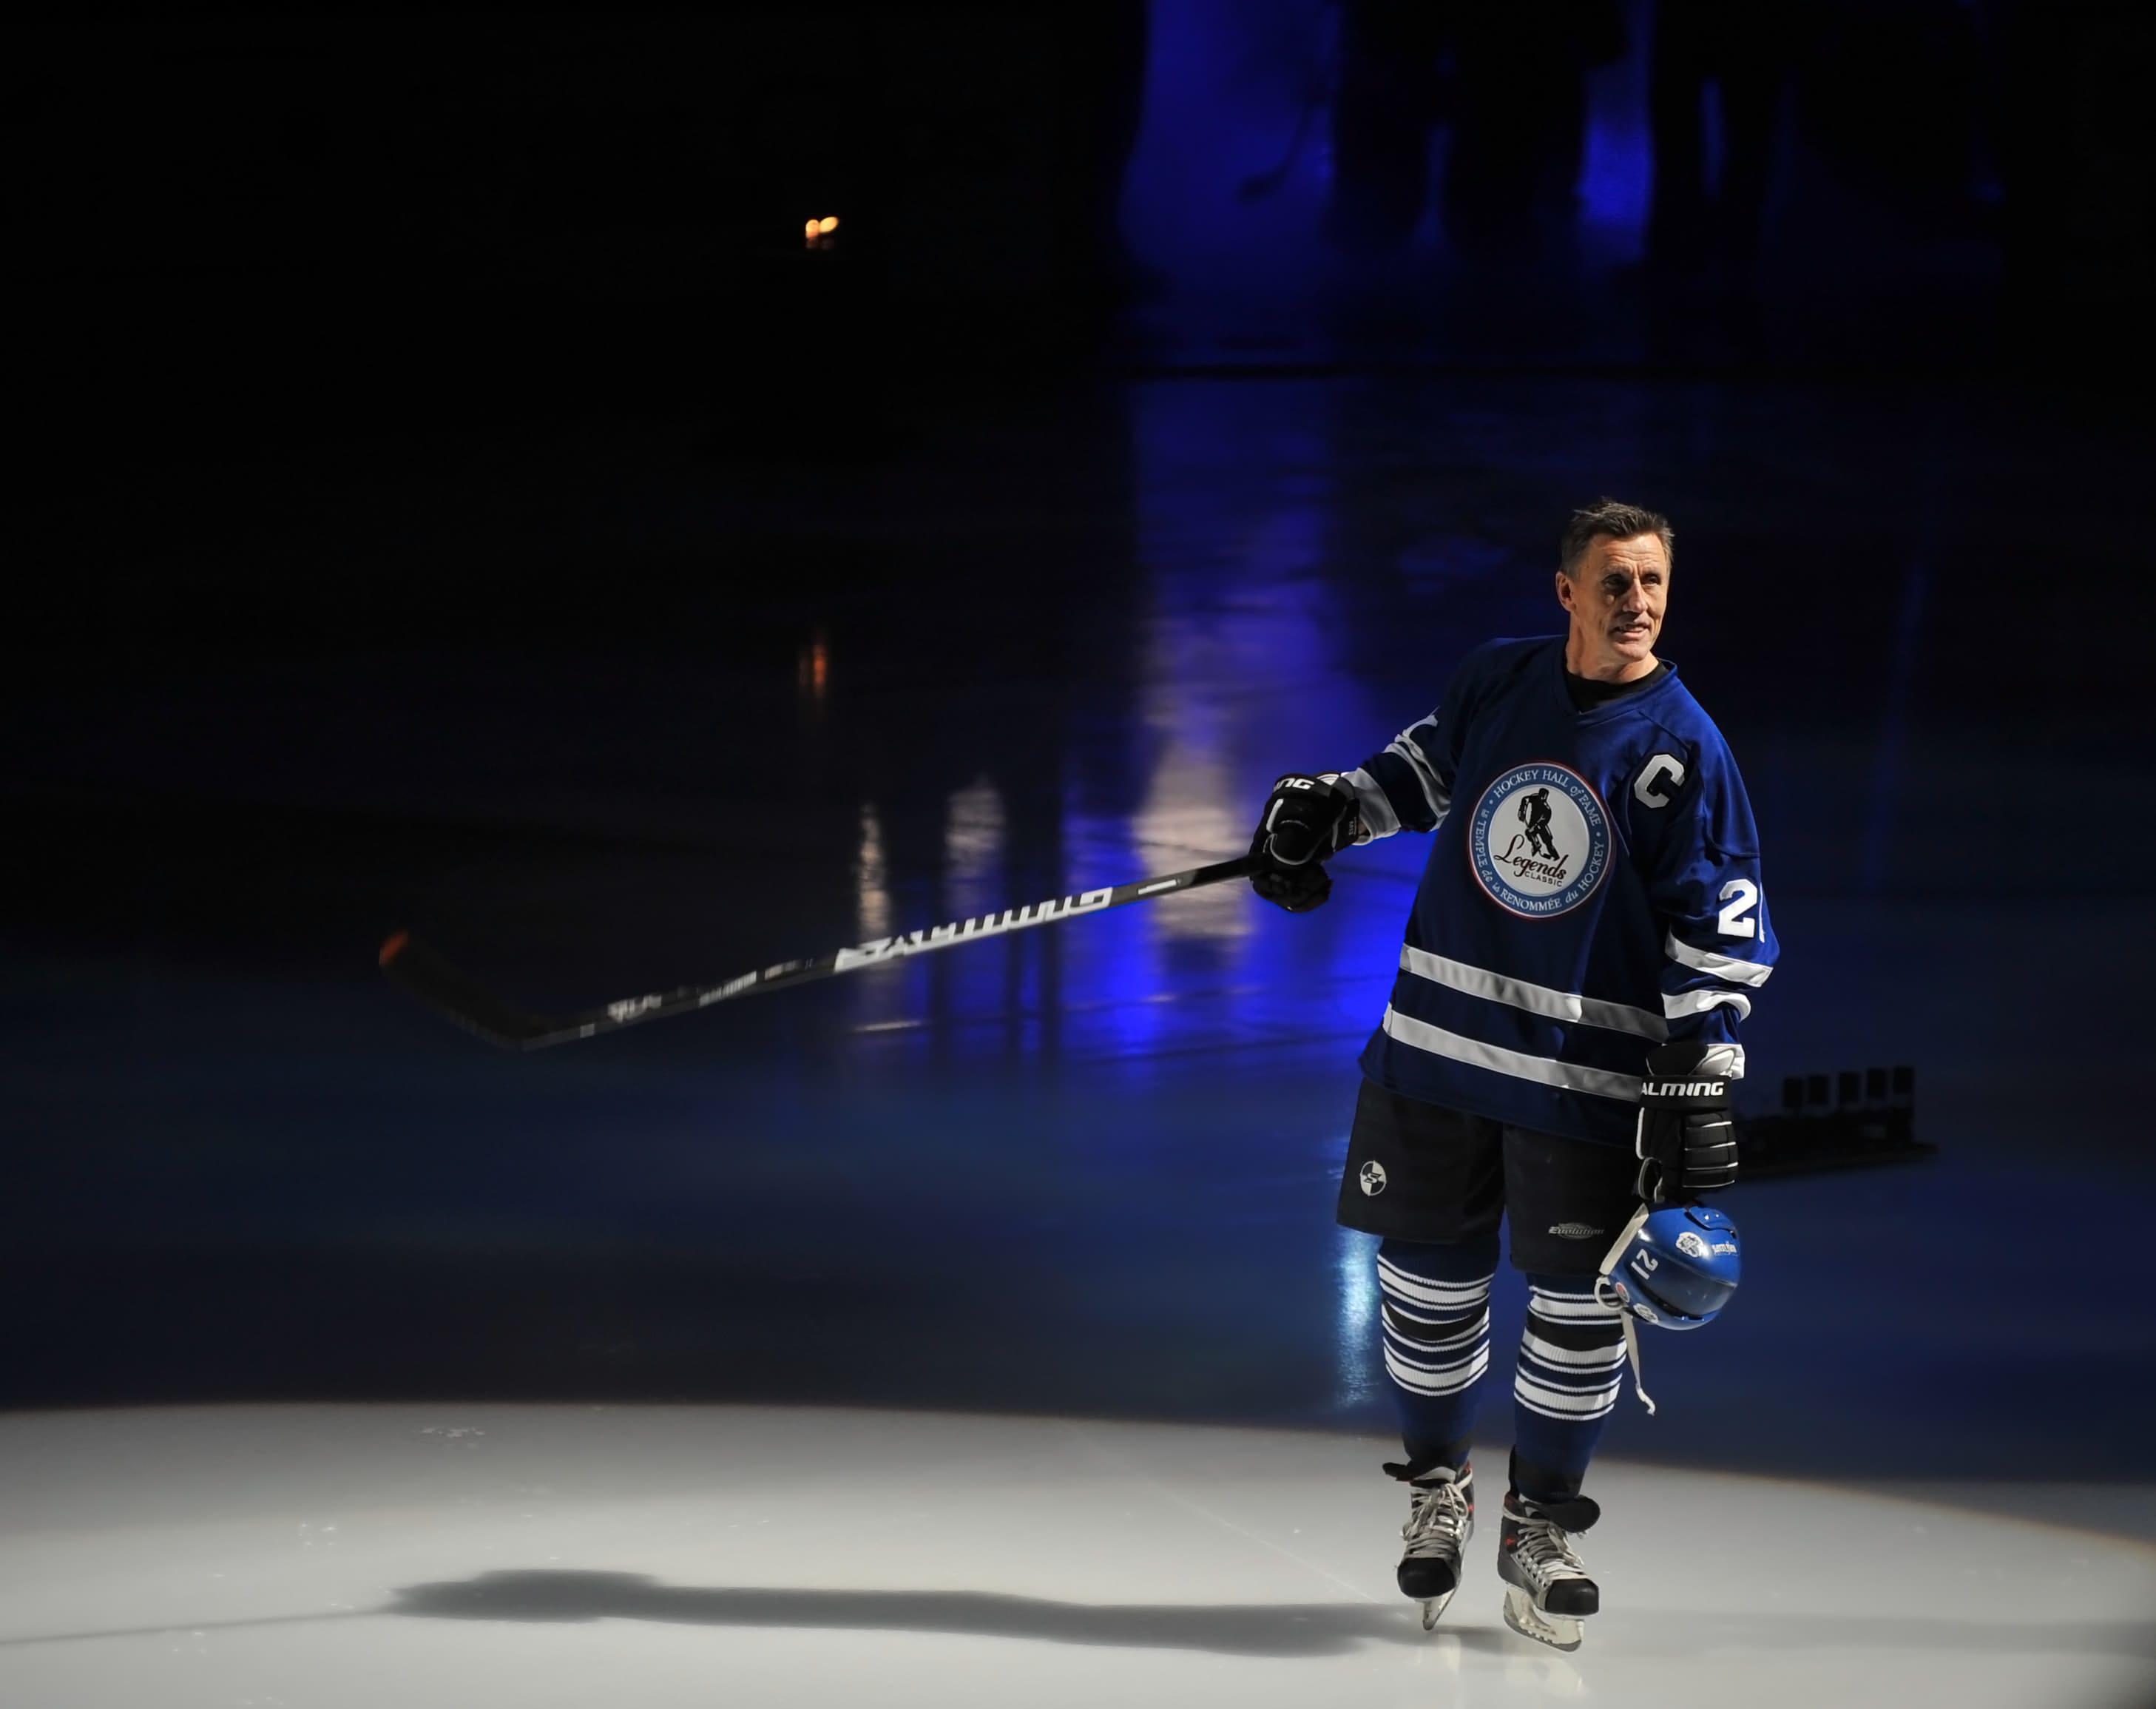 typy na NHL 28-29 lutego